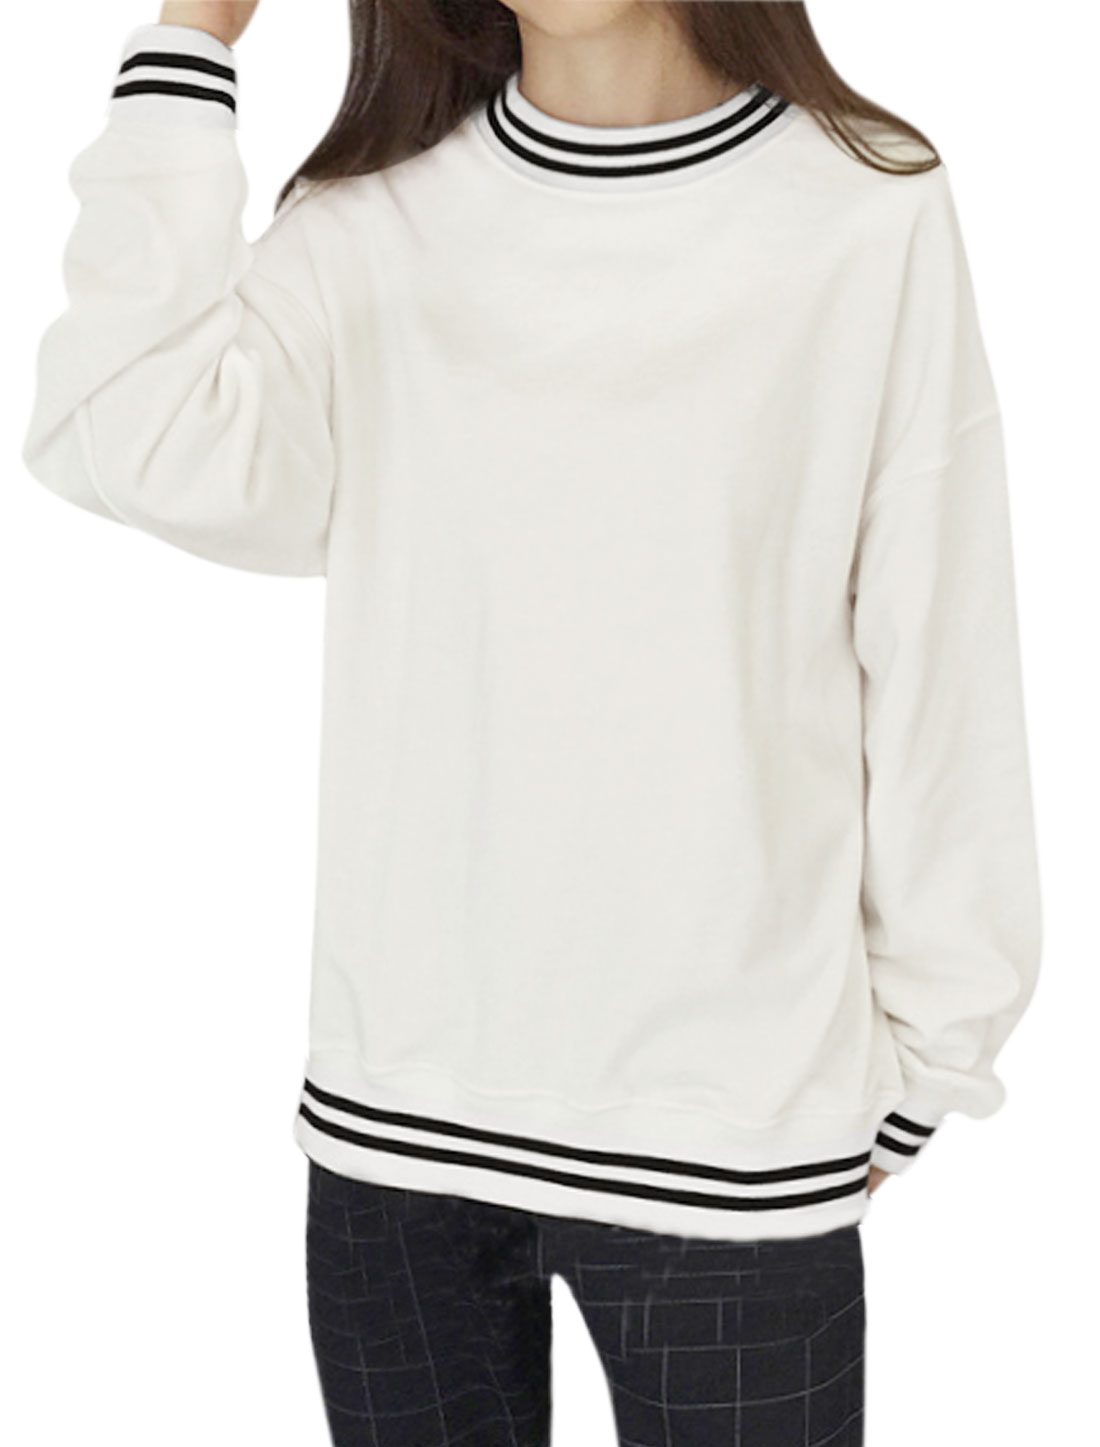 Women Crew Neck Long Sleeves Varsity-Striped Loose Fit Sweatshirt White XS